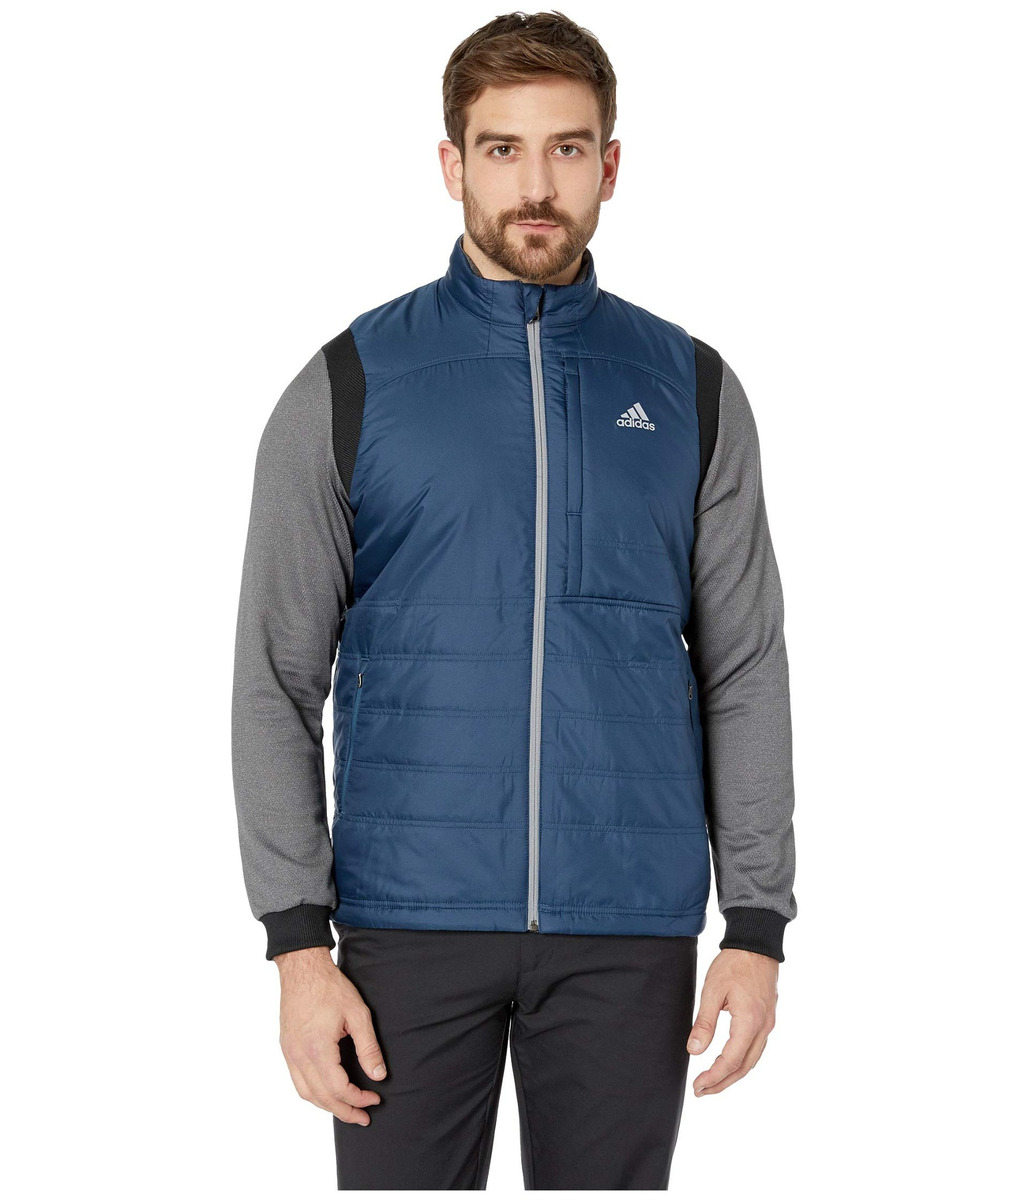 Primaloft Hombre Casaca Adidas Jacket Climaheat CdBxoWQre